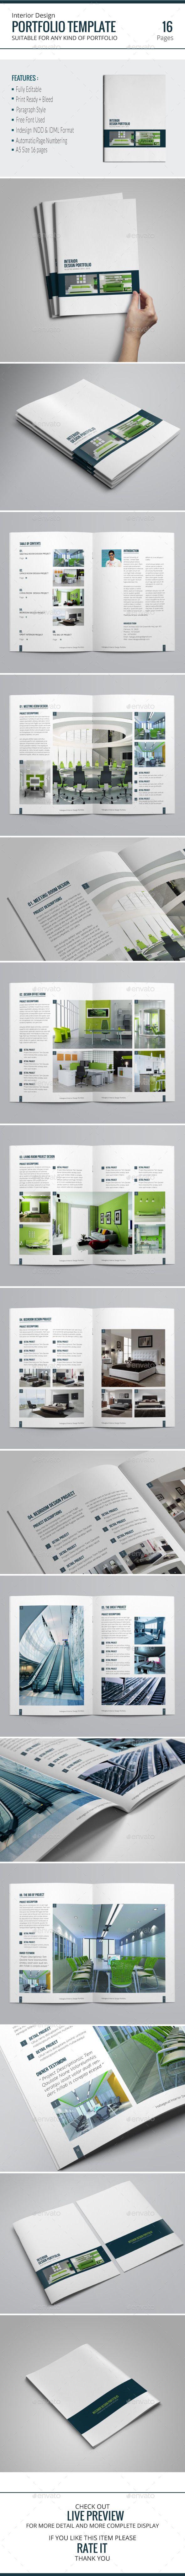 Portfolio Brochure Template — InDesign INDD #clean portfolio #photography portfolio • Available here → https://graphicriver.net/item/portfolio-brochure-template/9719532?ref=pxcr